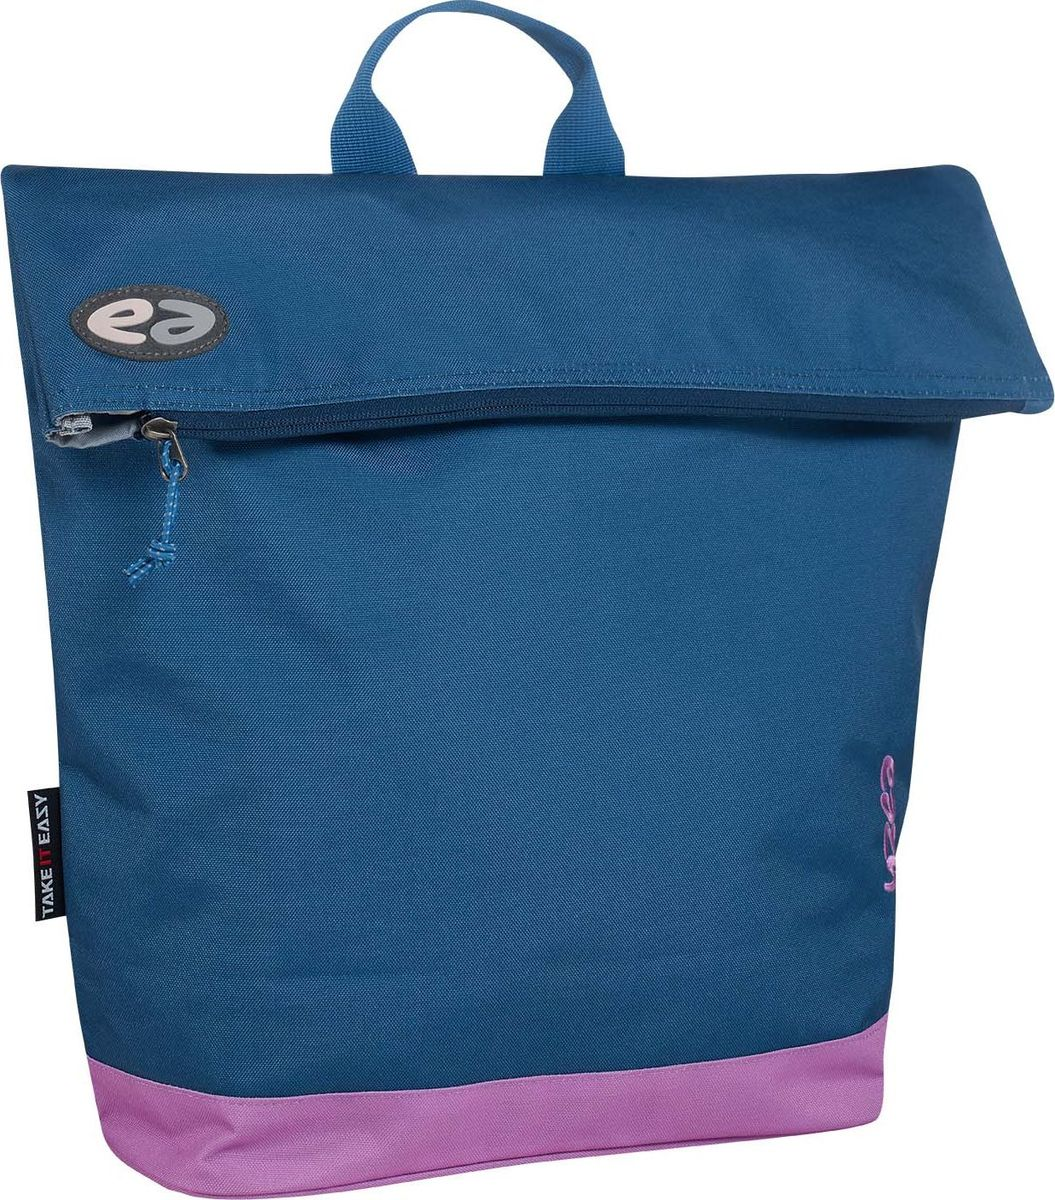 Thorka Рюкзак детский YZEA Courier Магия booq boa courier bcr10 gft сумка для ipad graphite